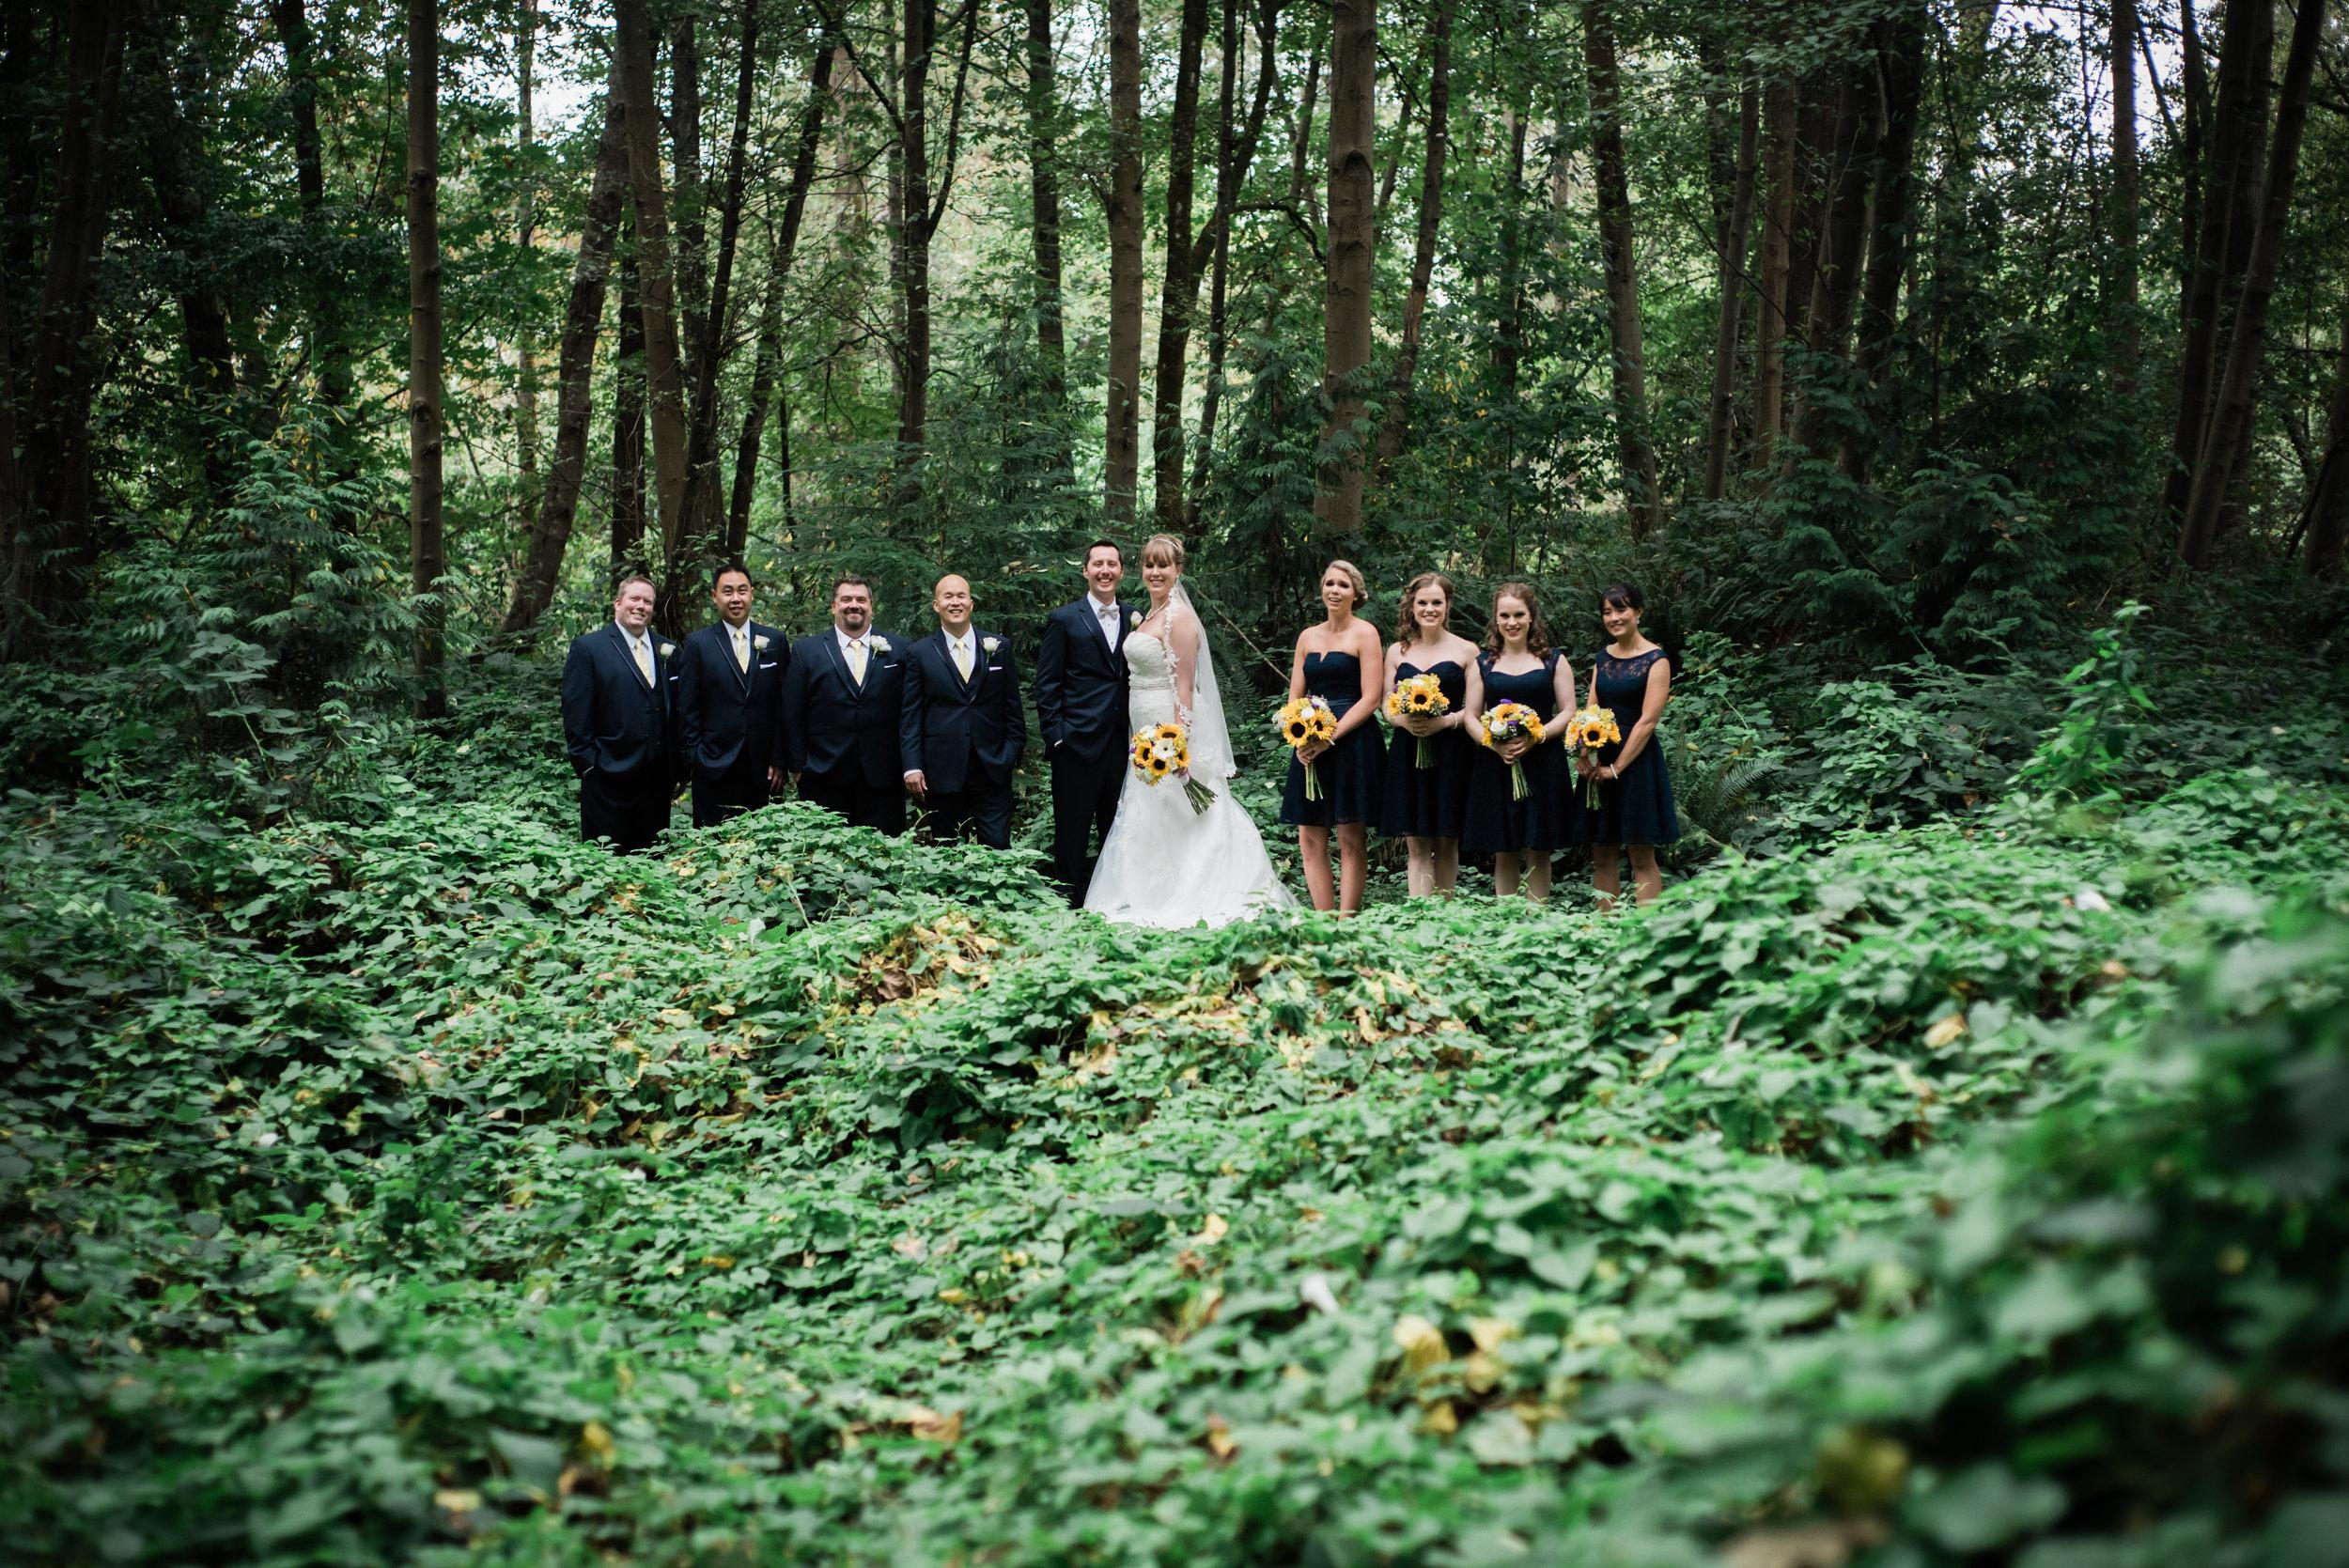 Amanda-rene-wedding-0454-jelger-tanja-photographers.jpg